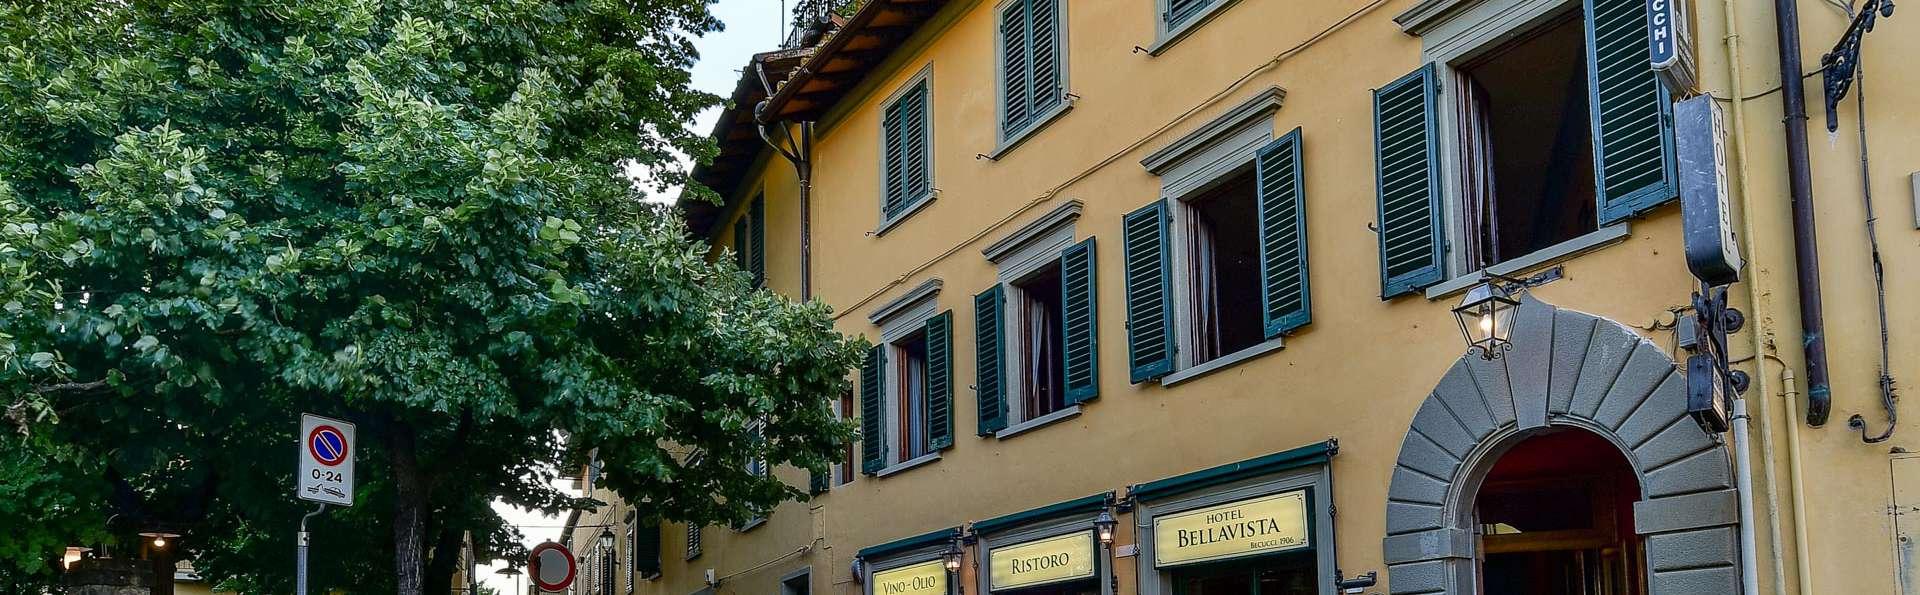 Hotel Bellavista Impruneta - EDIT_FRONT_01.jpg